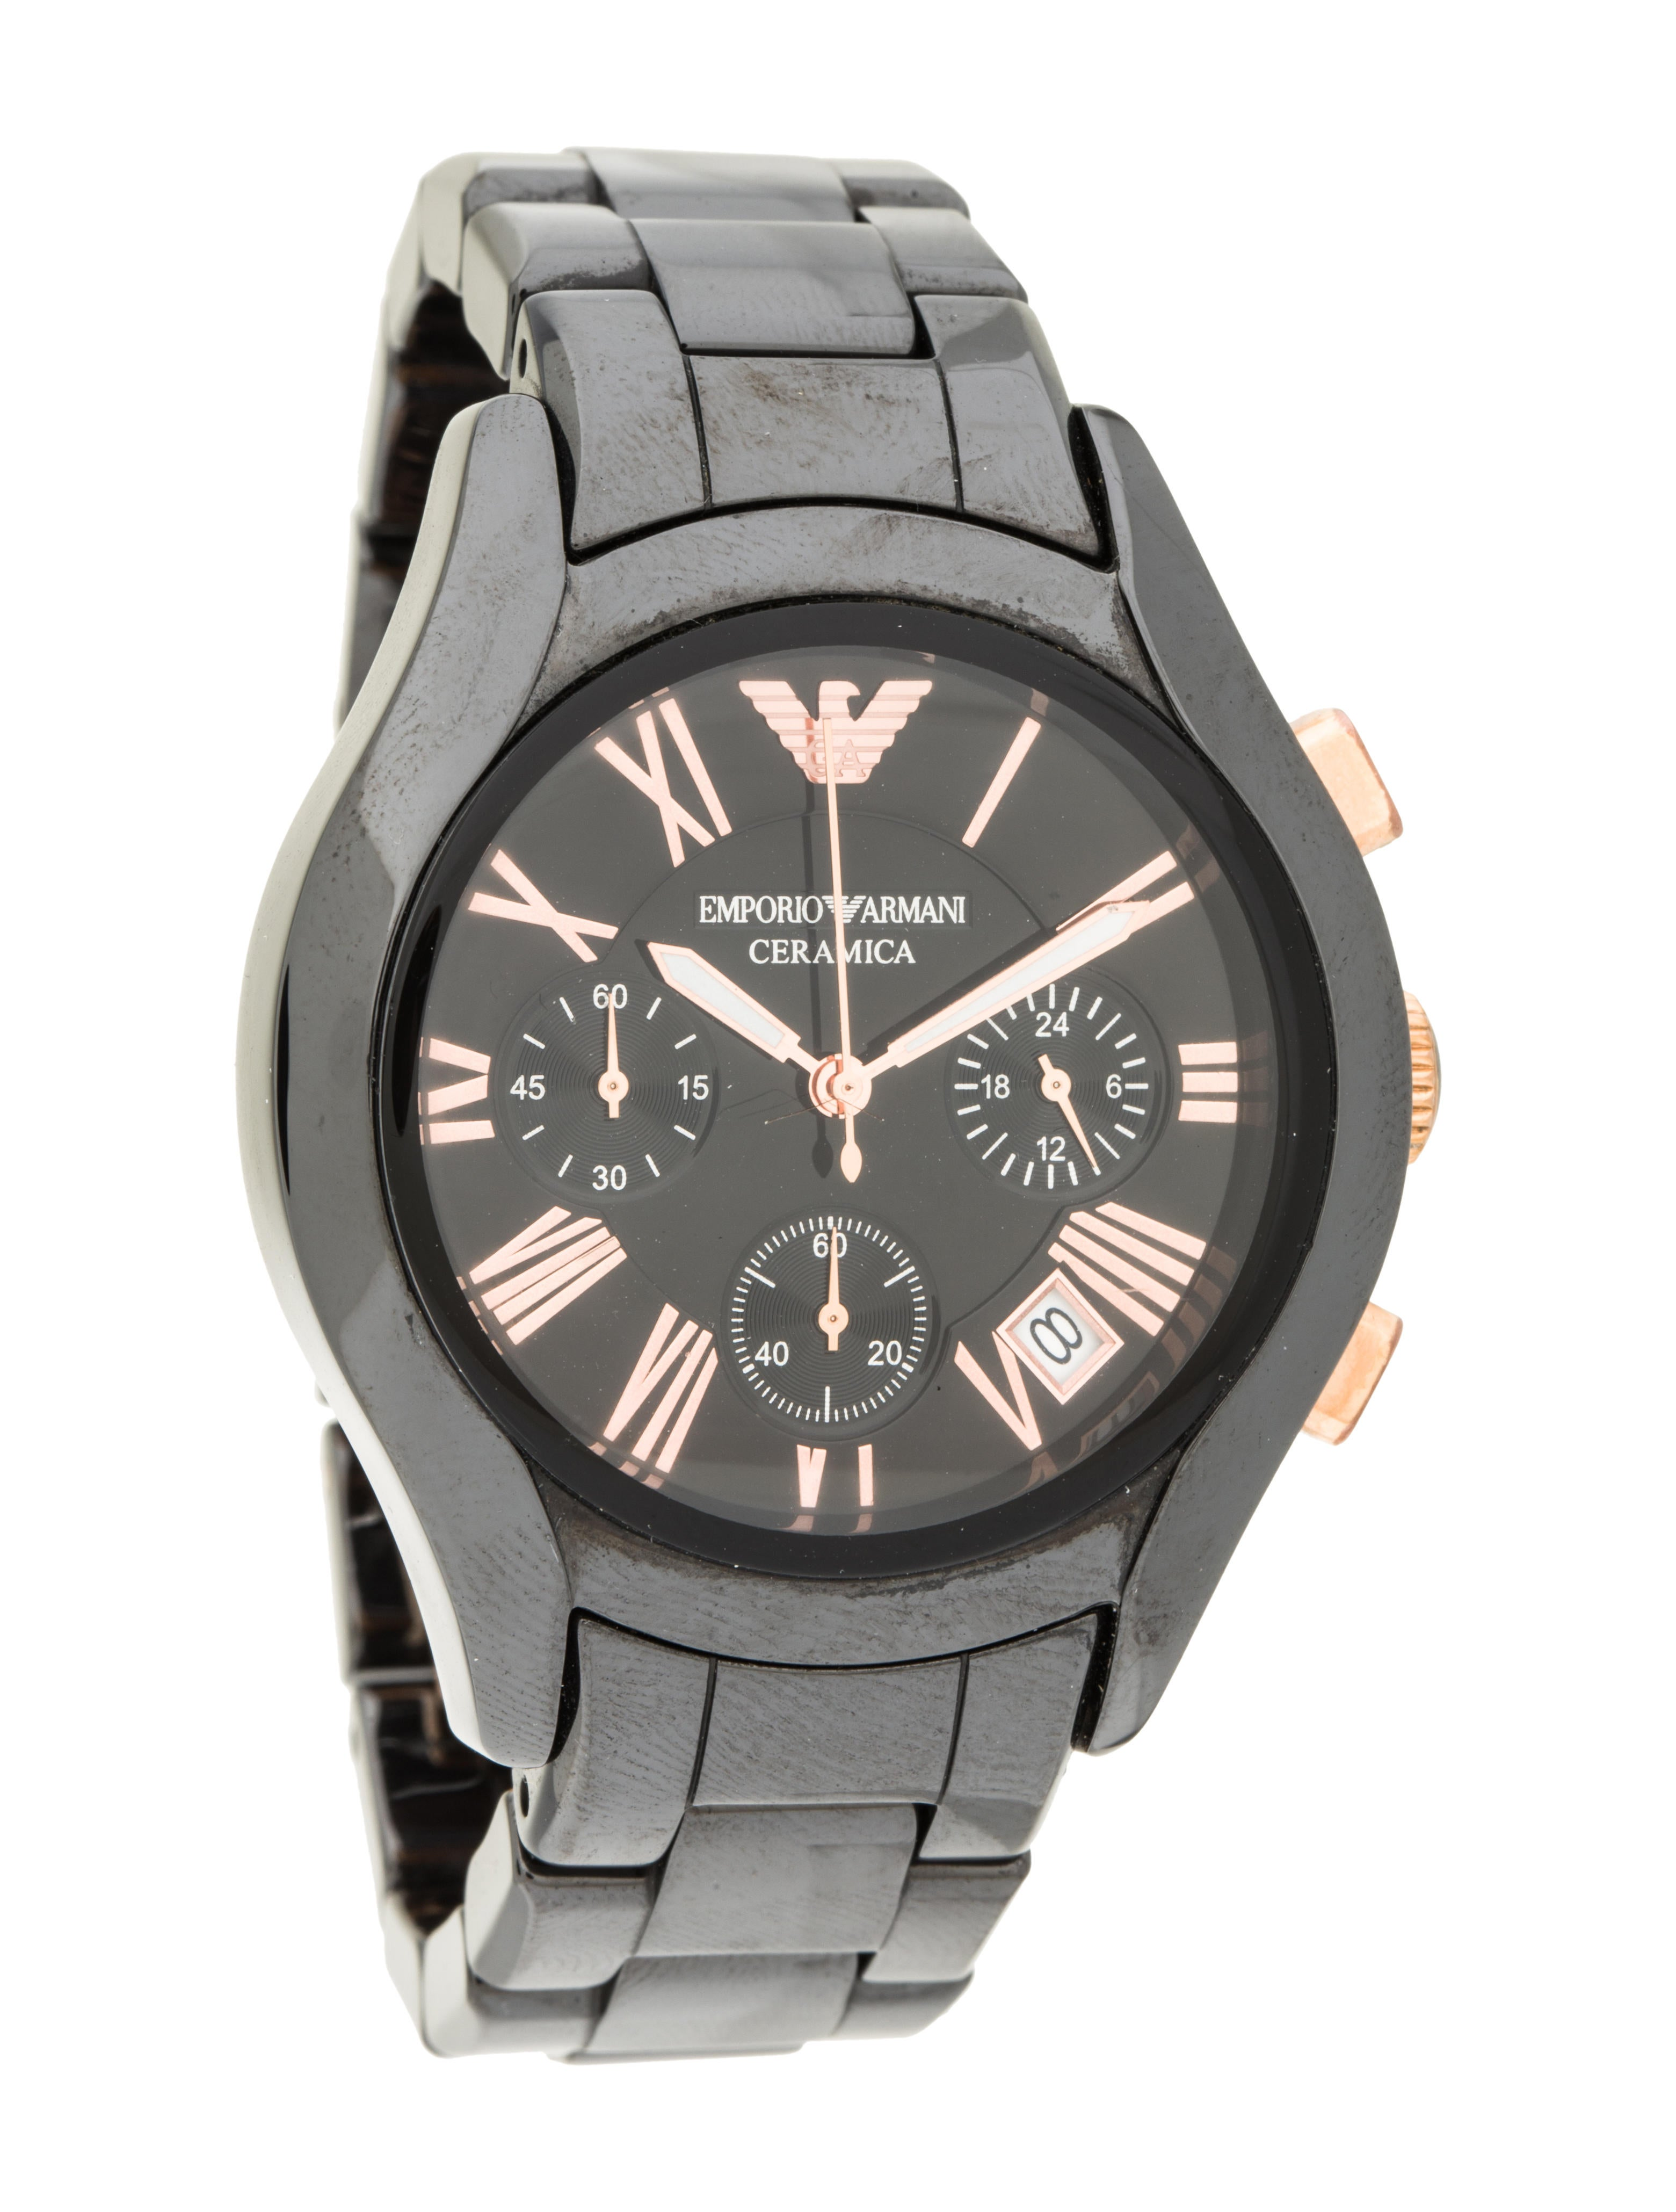 emporio armani black ceramic chronograph watch bracelet. Black Bedroom Furniture Sets. Home Design Ideas